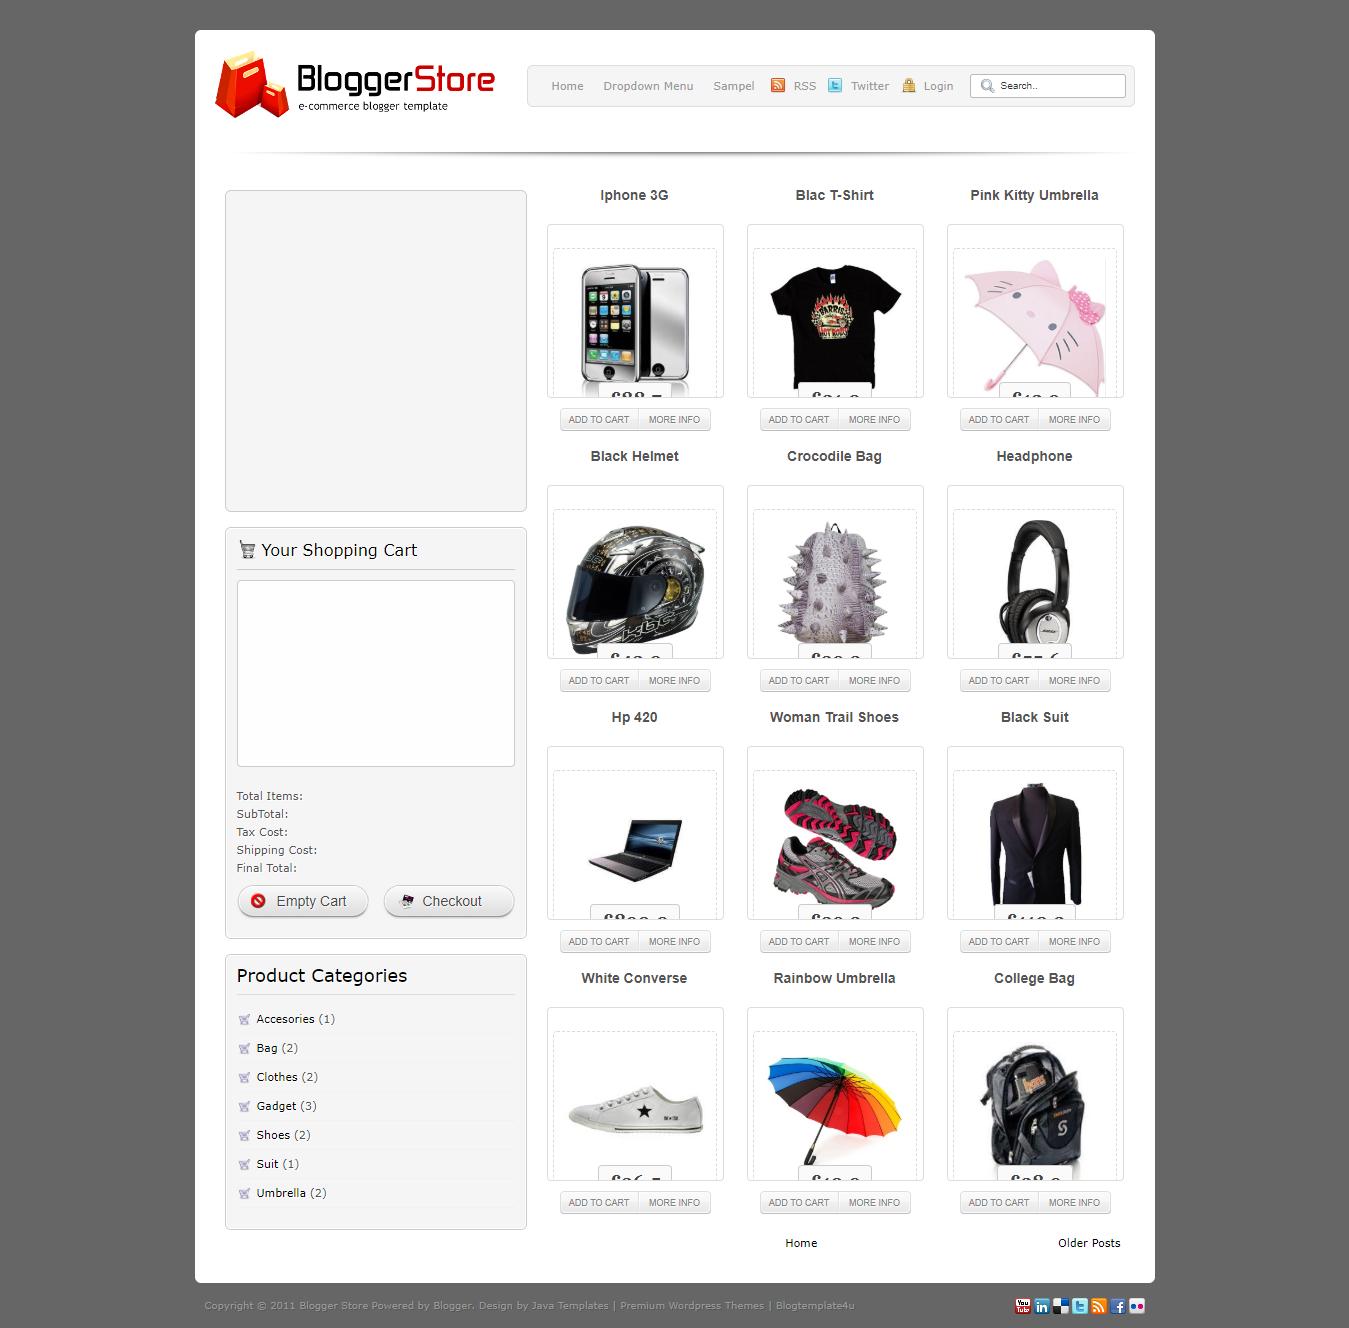 Blogger store ecommerce blogger template zona template description maxwellsz